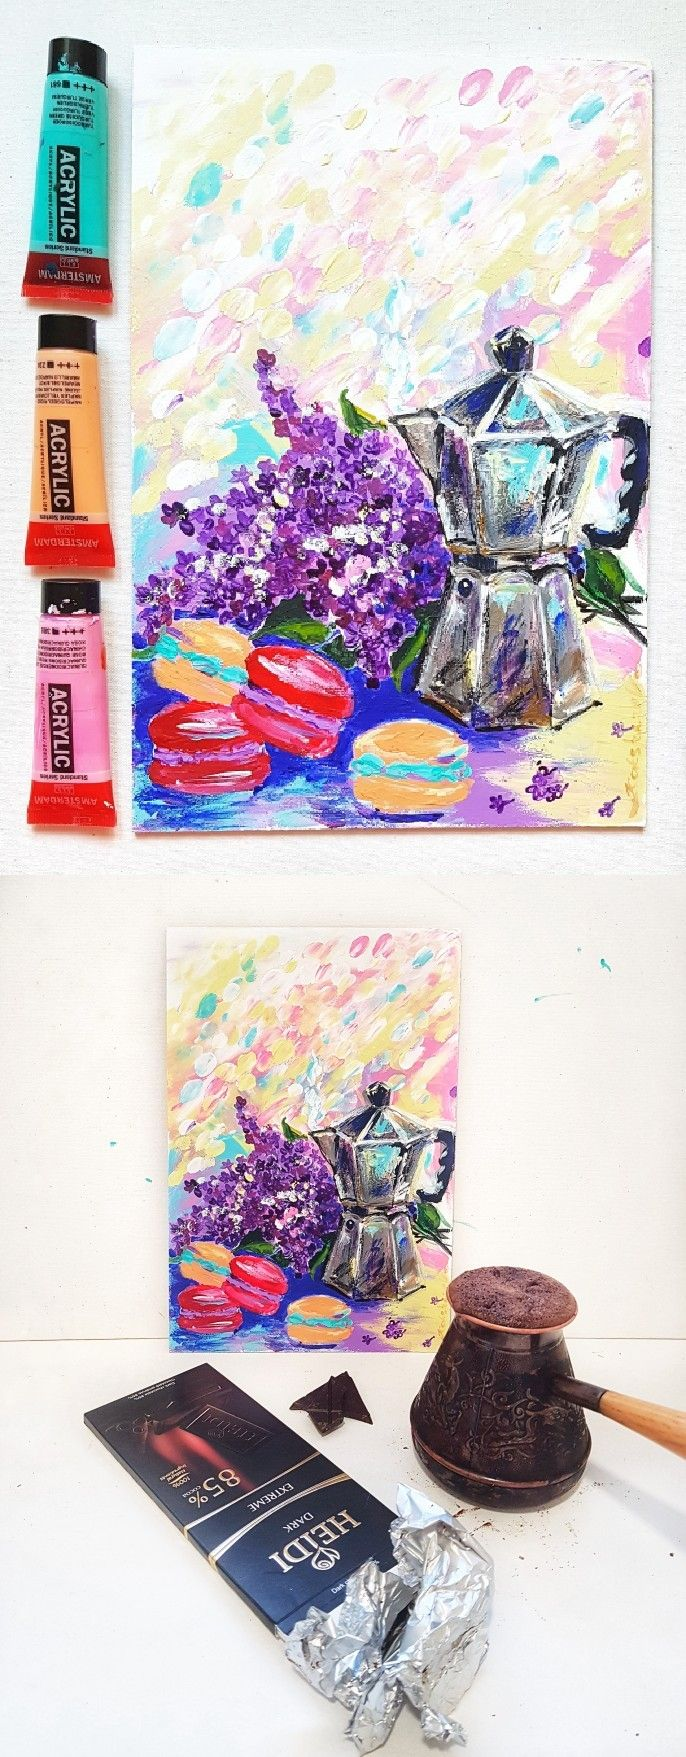 Lilac, coffee, macarons - original acrylic painting on board. Kitchen decor, gift for coffee lovers. #kitchen #kitchendecor #art #painting #originalpainting #coffee #macarons